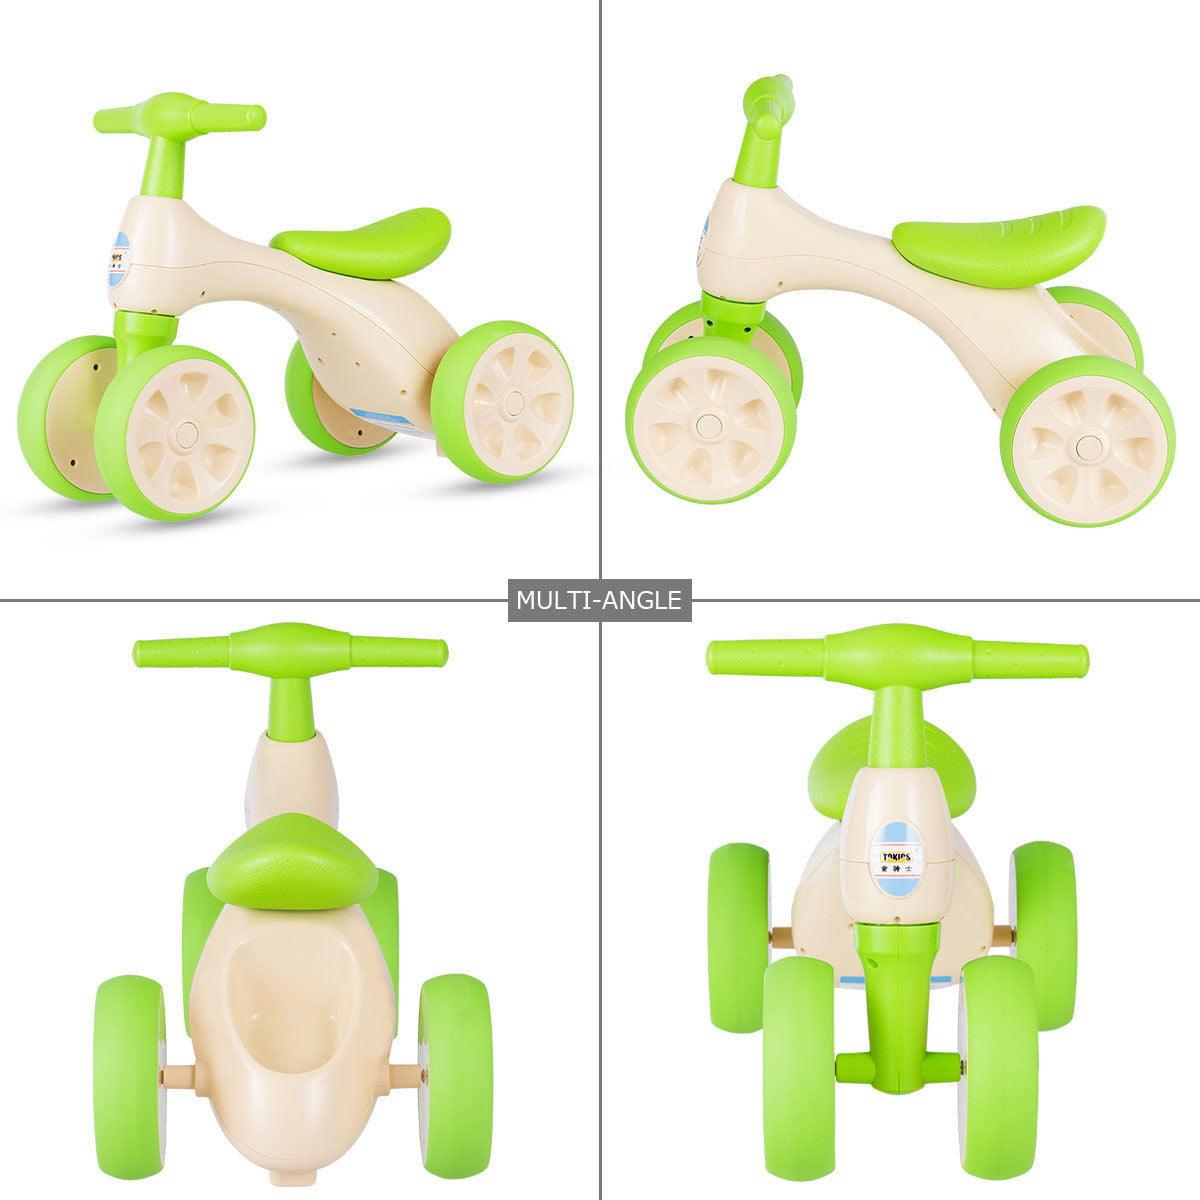 Costway Baby Balance Bike No Pedal Bicycle Children Walker 4 Wheels w/ Sound & Storage - image 7 de 10